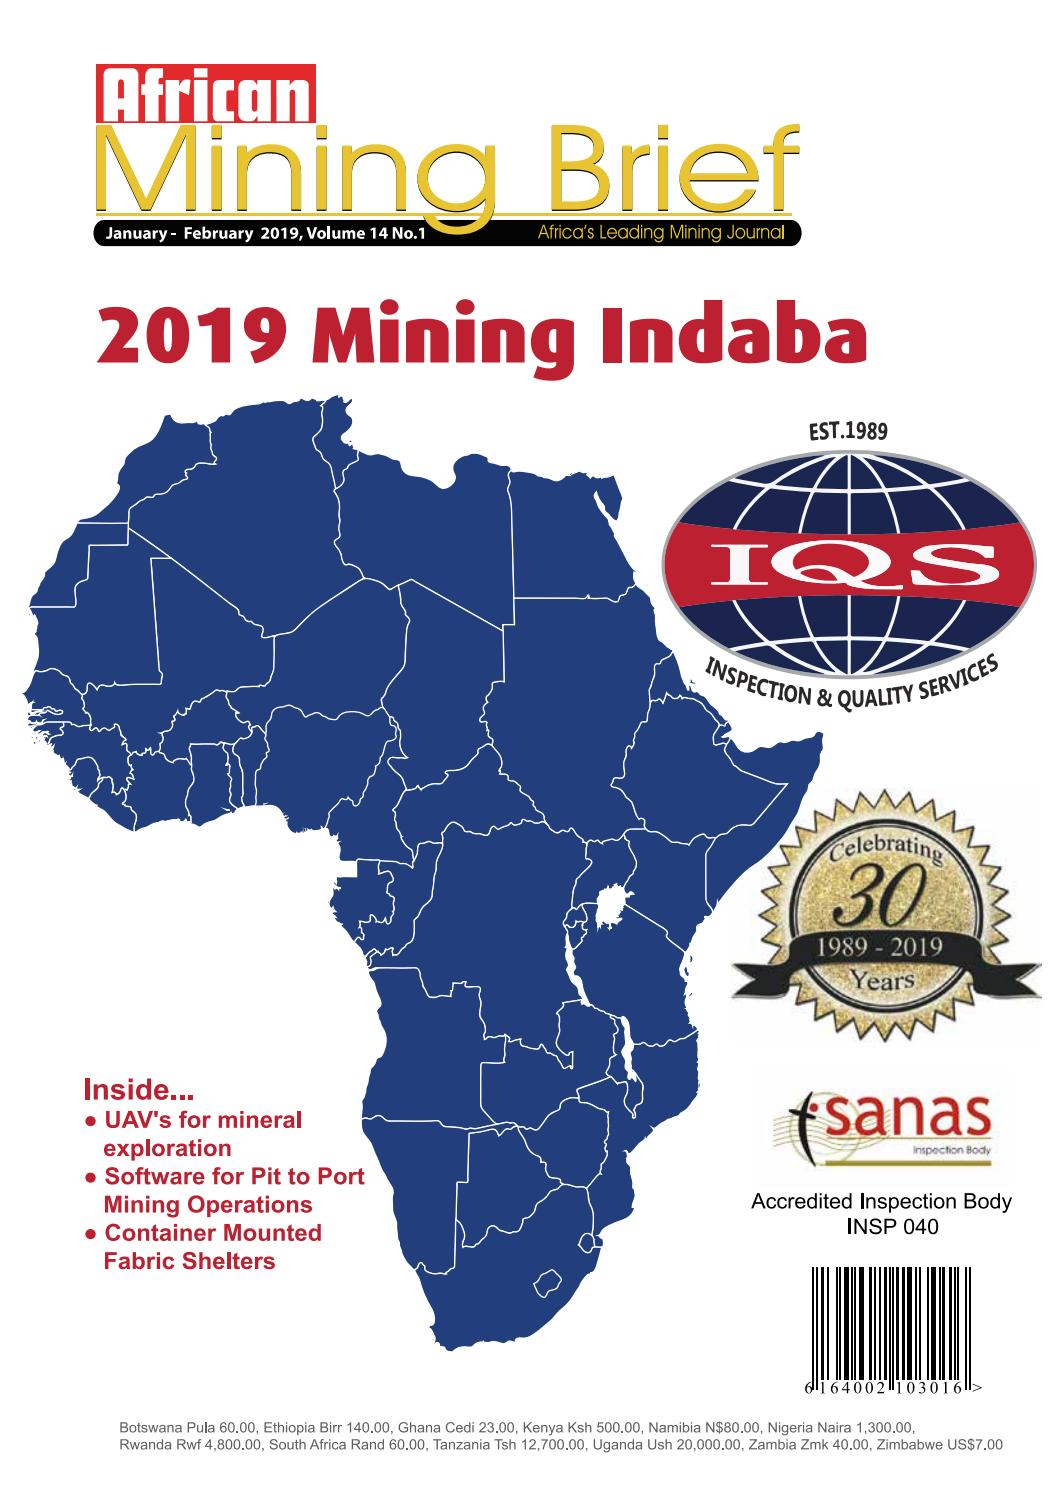 African Mining Brief - Jan/Feb 2019 by AMBriefonline - issuu